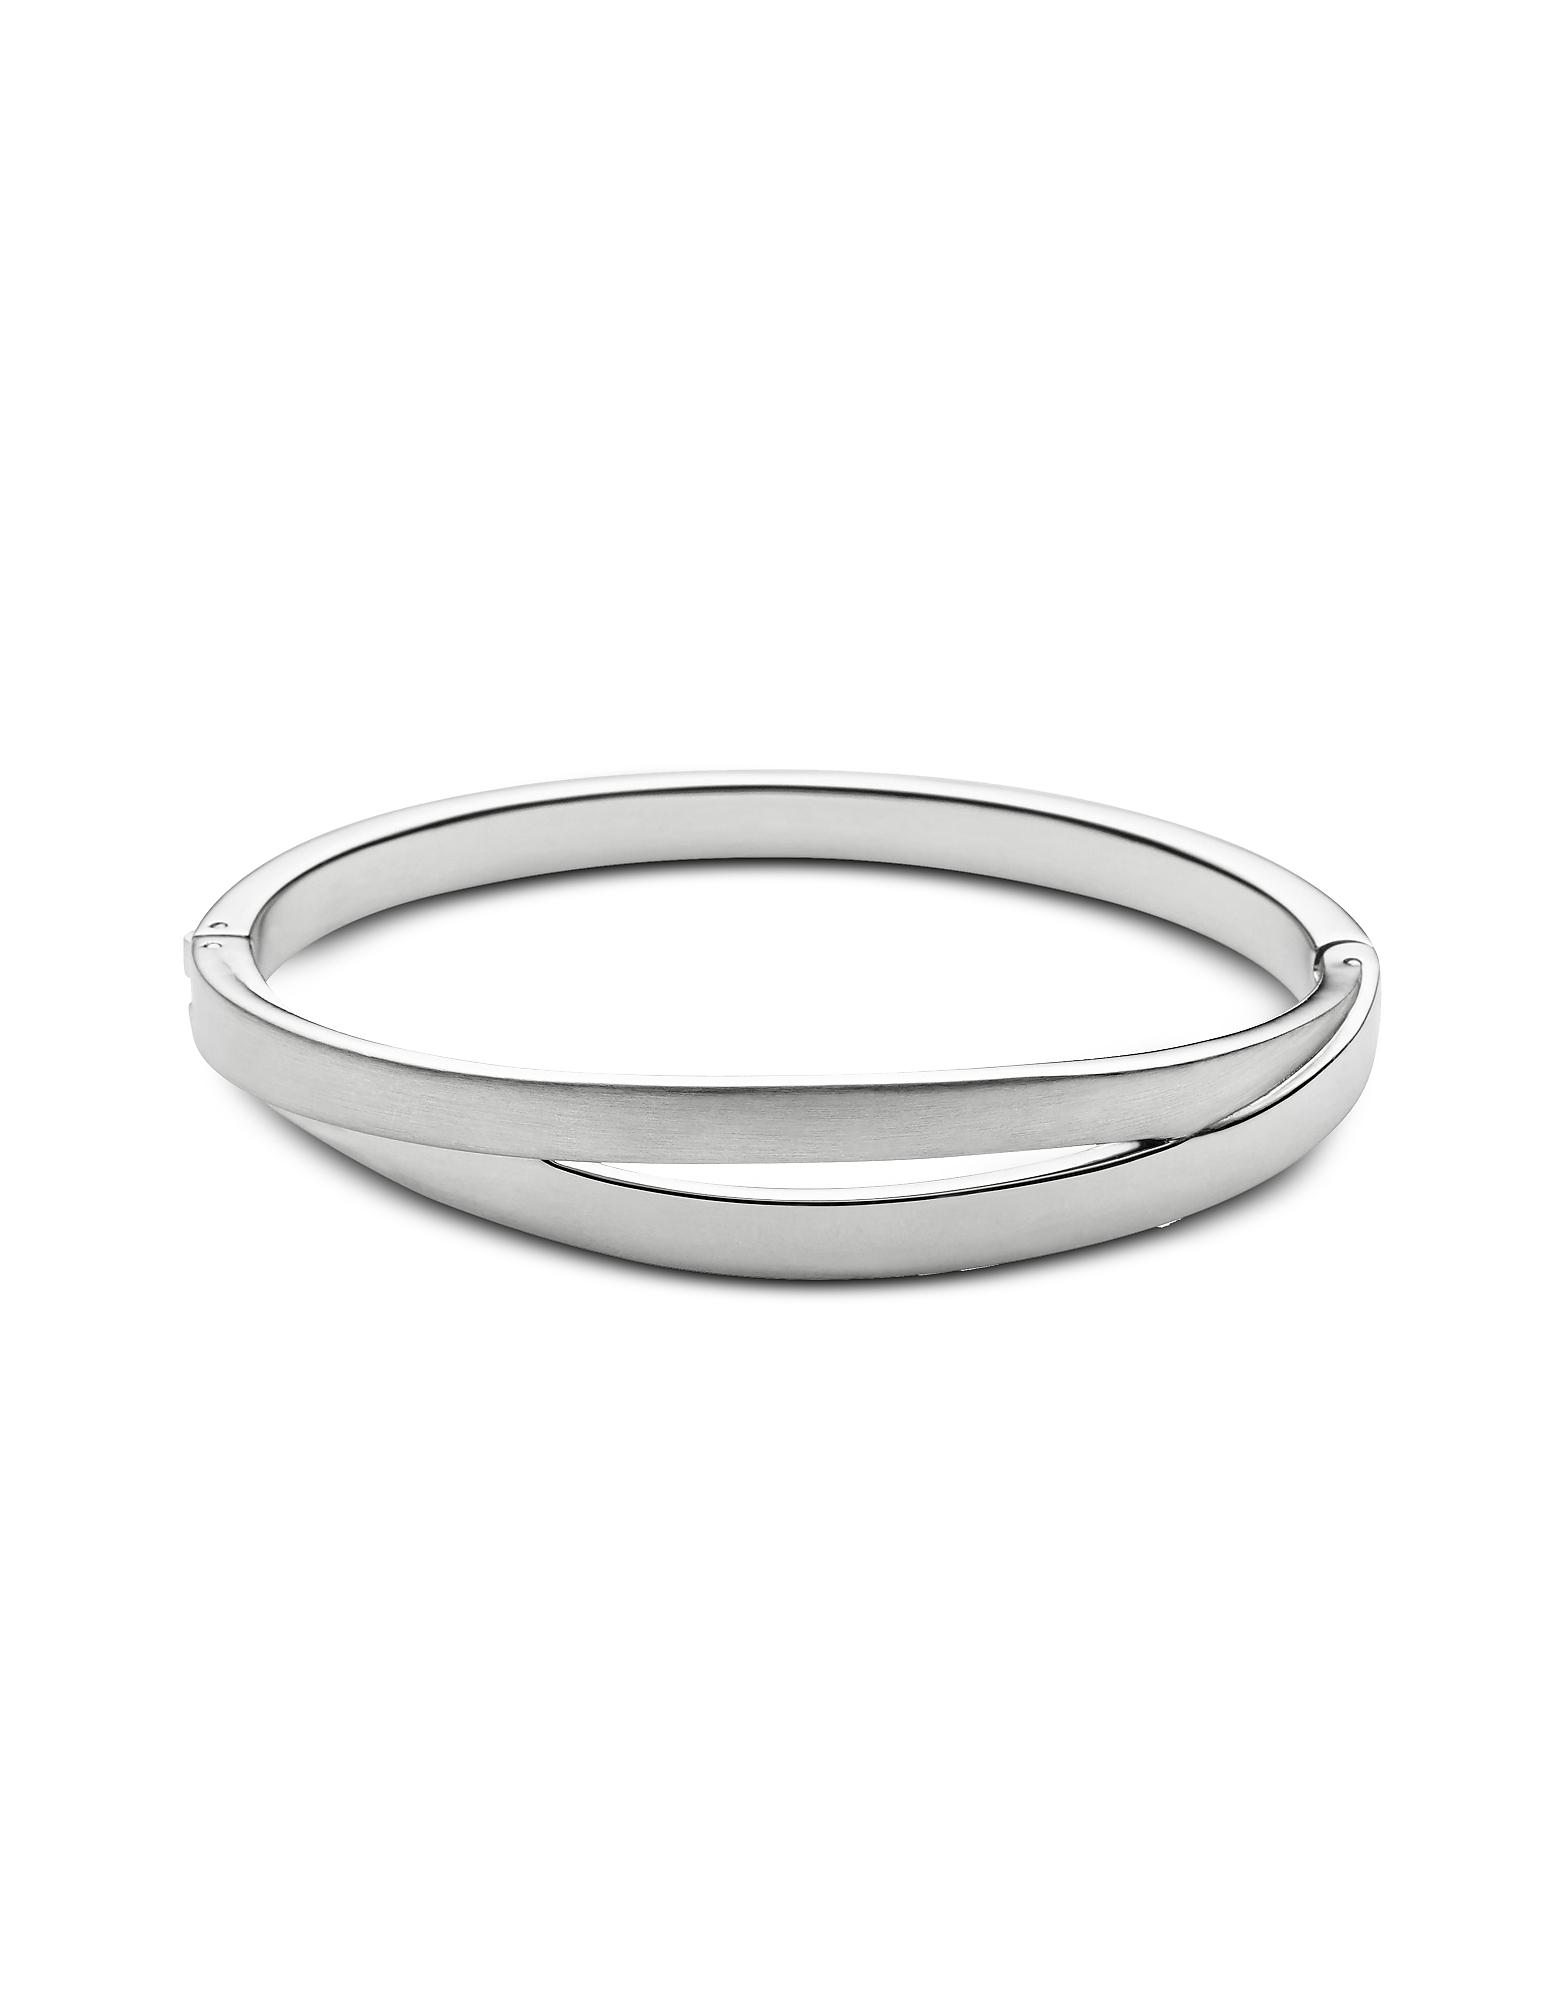 Skagen Bracelets, Elin Silver Tone Bangle Bracelet